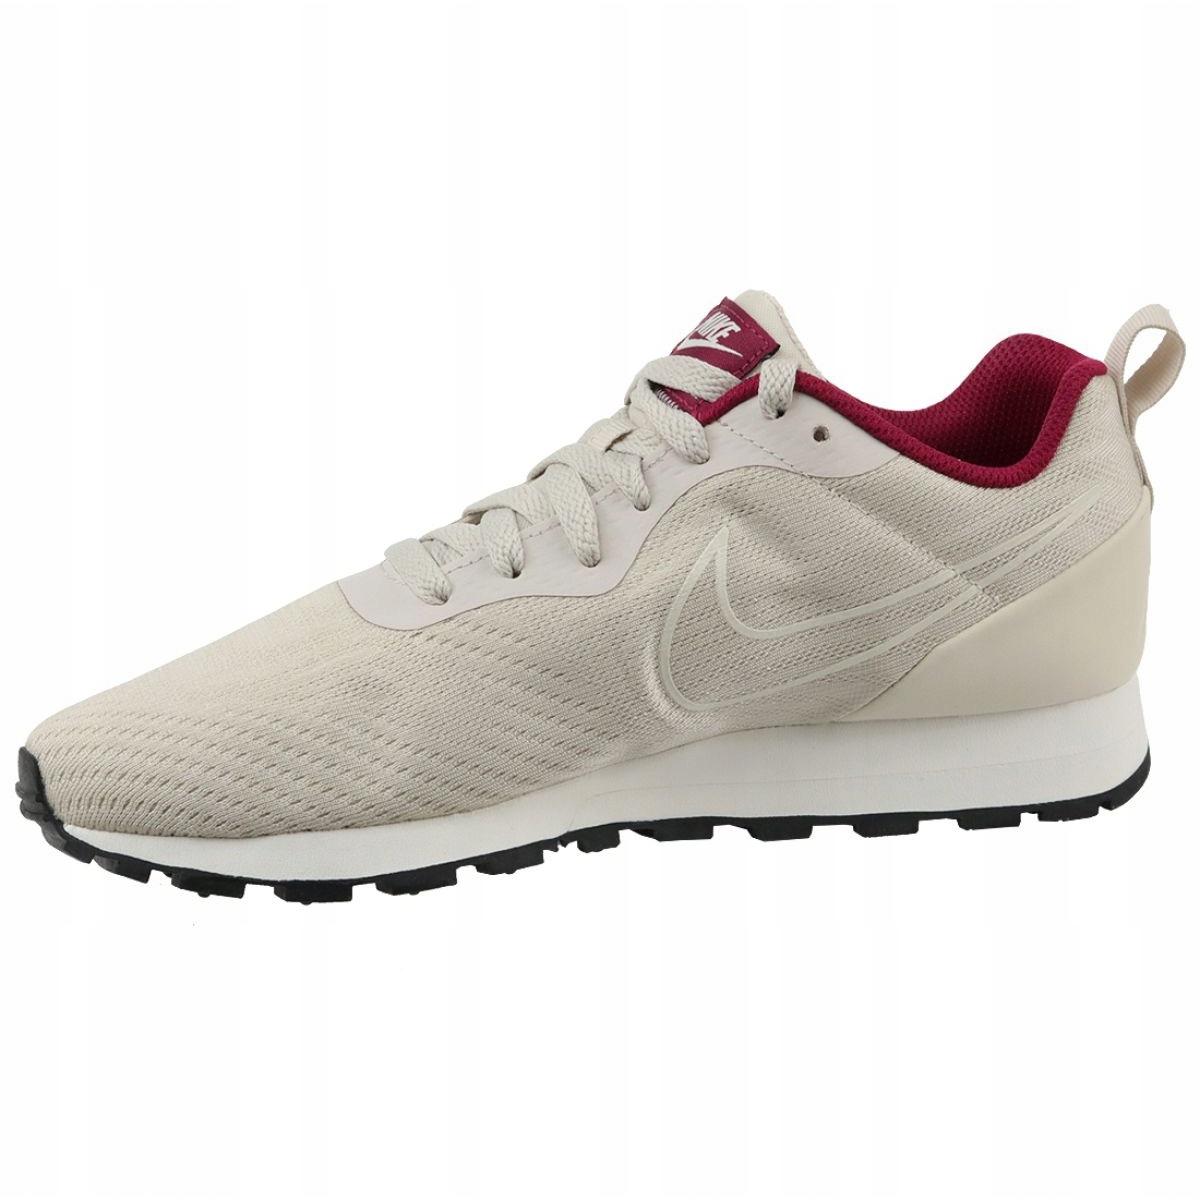 Zapatos clásicos Zapatillas Nike MD RUNNER 2 en Gris Mujer